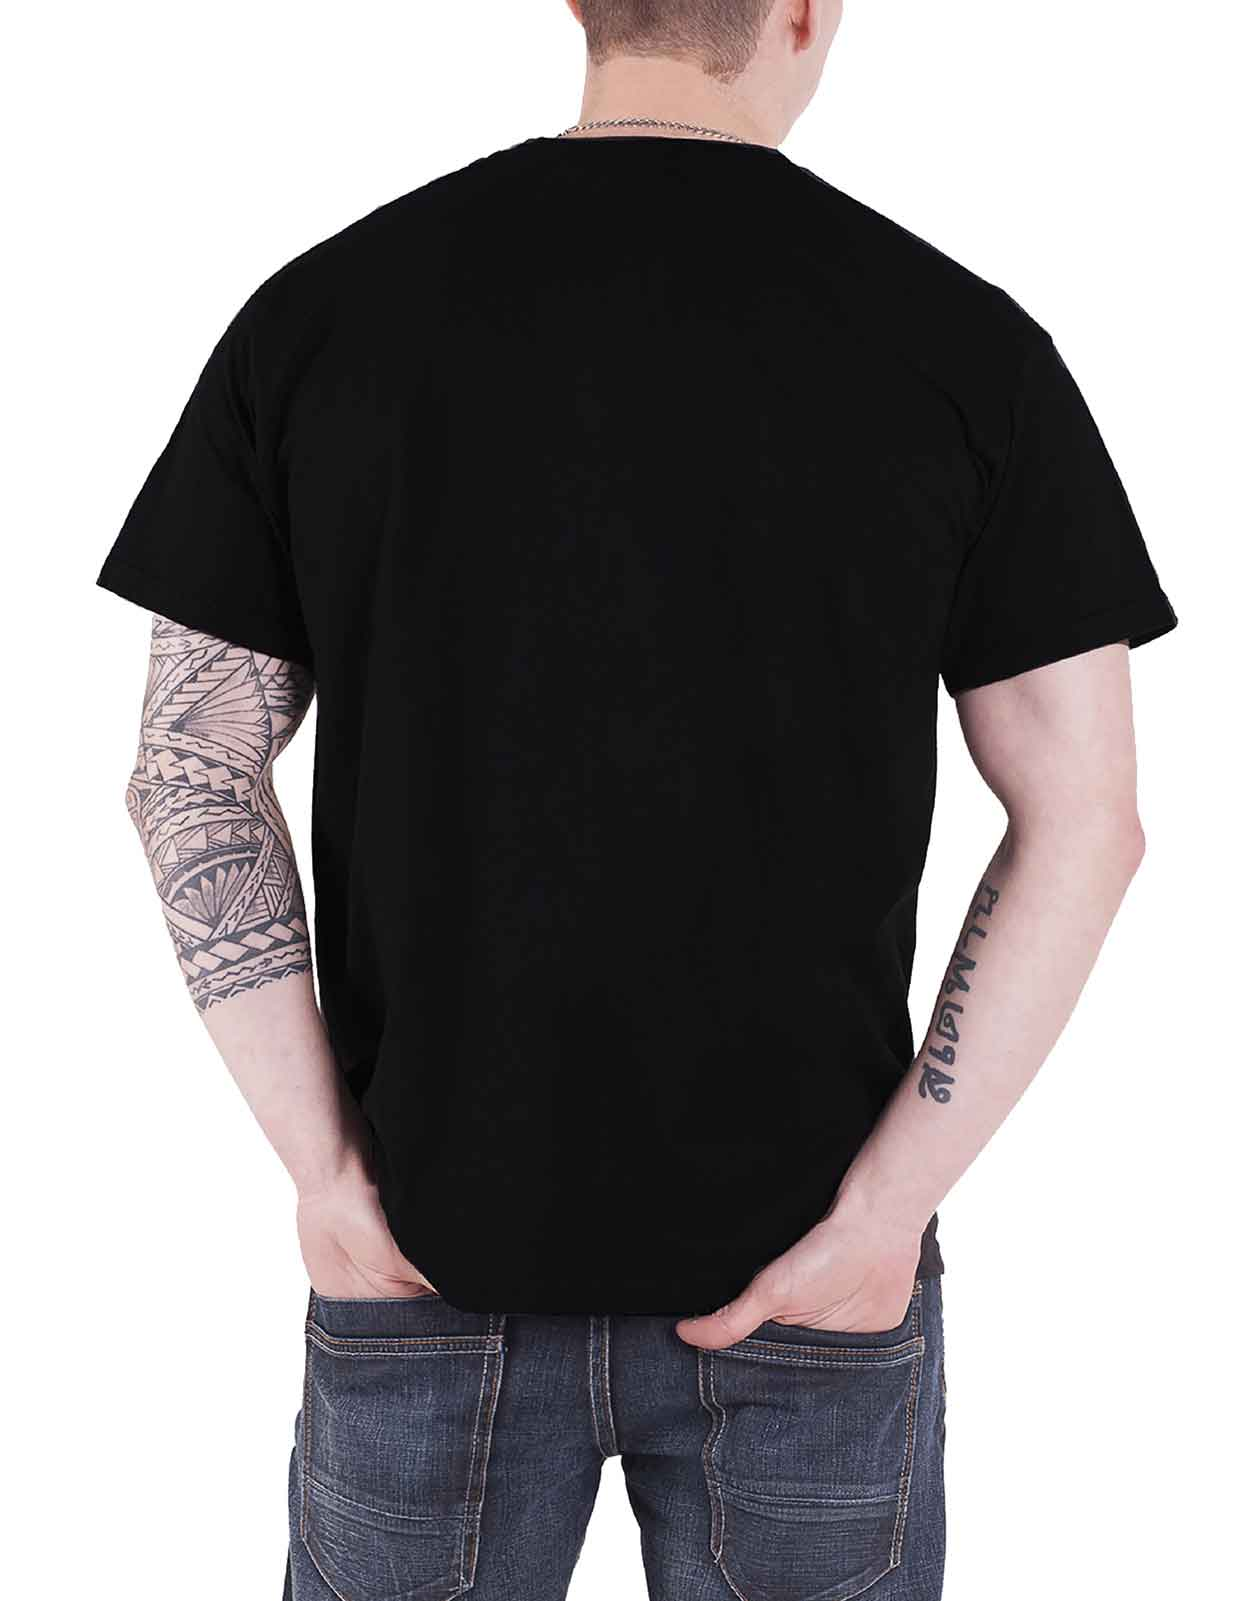 Motorhead-T-Shirt-Lemmy-RIP-England-warpig-clean-your-clock-official-new-mens Indexbild 43